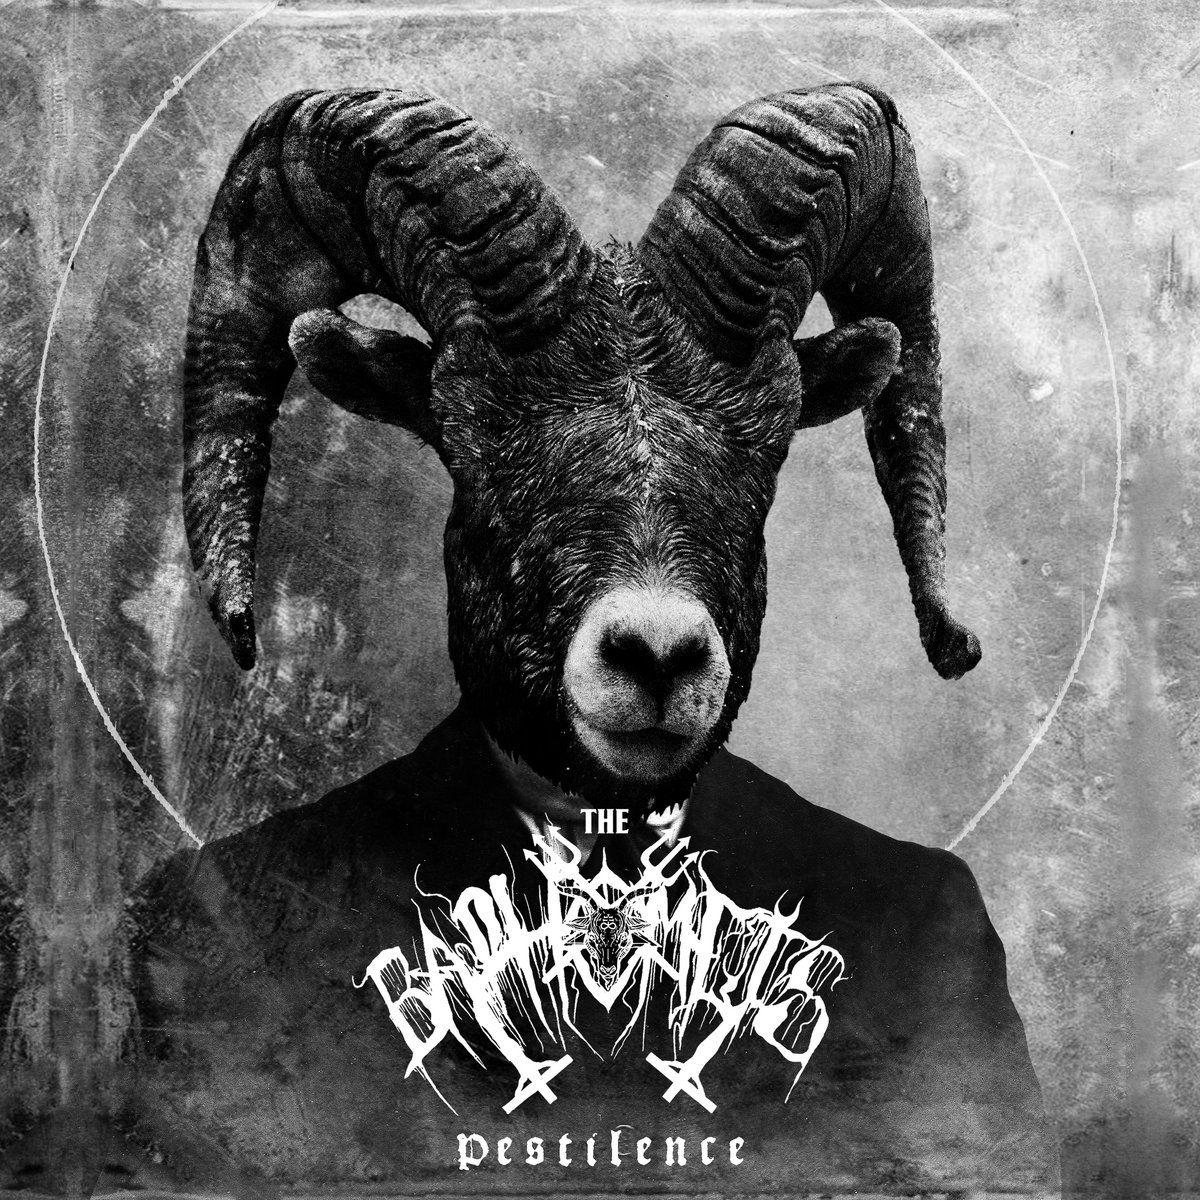 The Baphomets - Pestilence